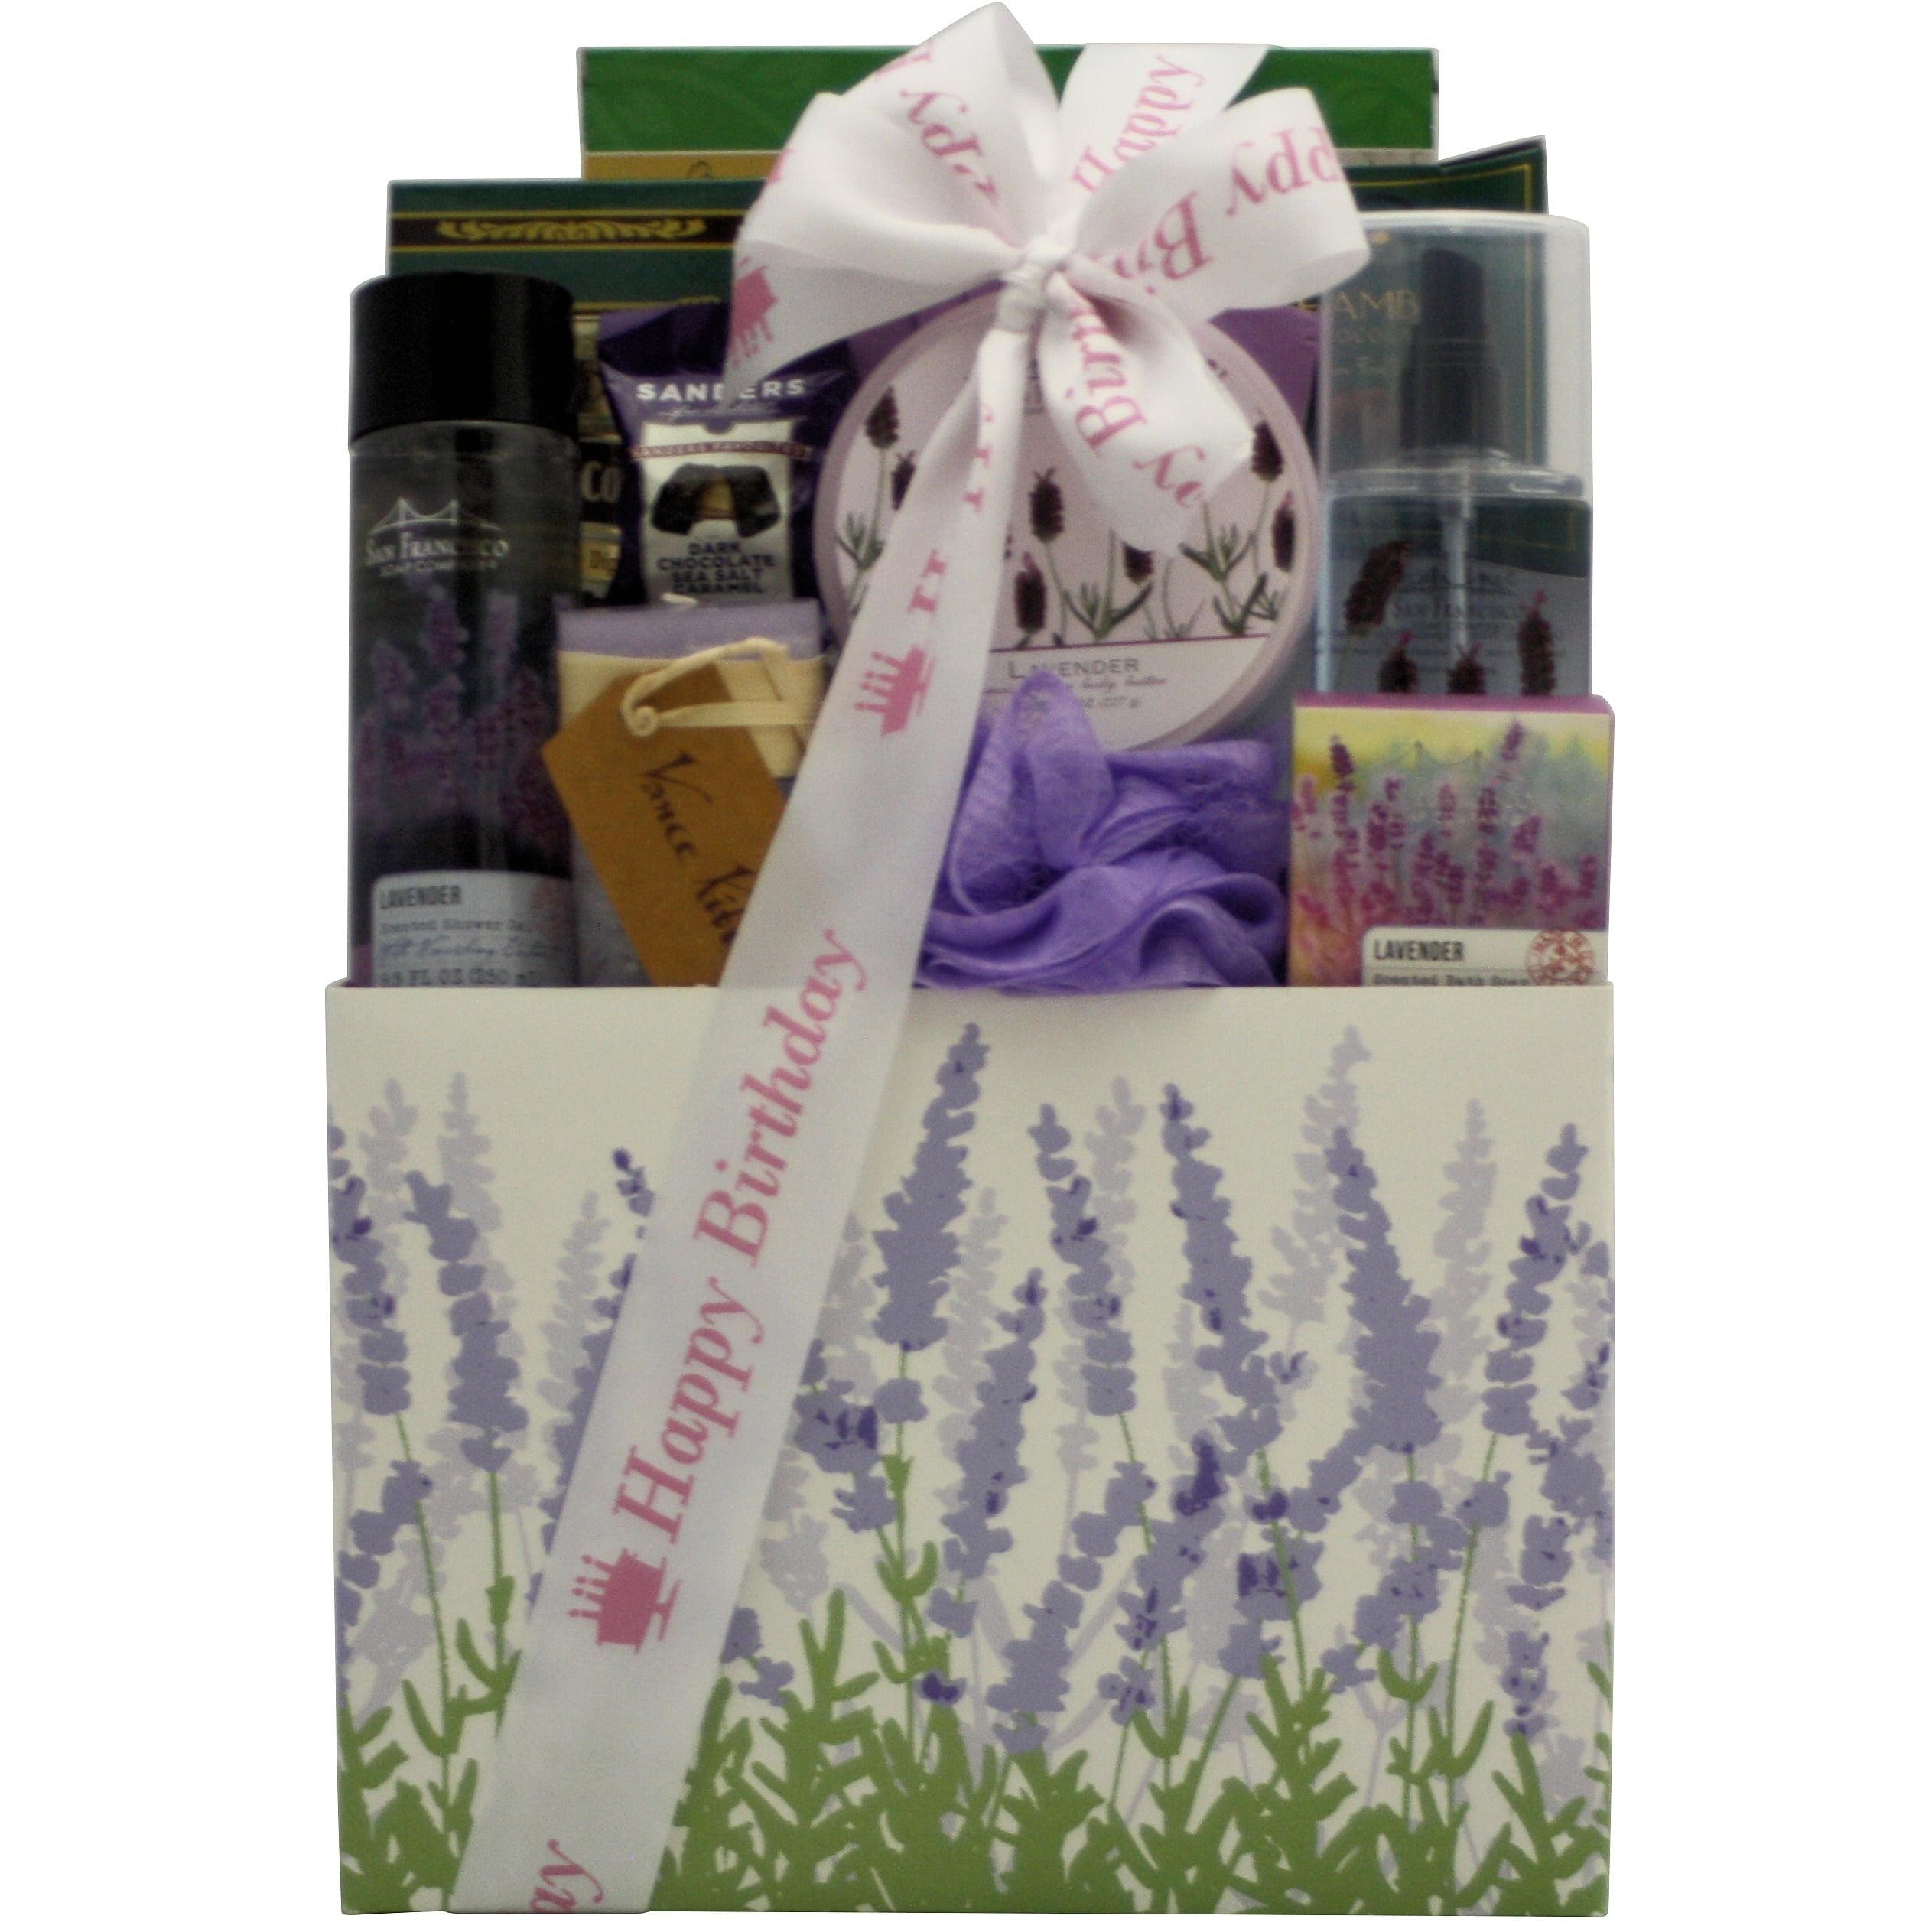 Lavender Spa Pleasures Bath Body Birthday Gift Basket